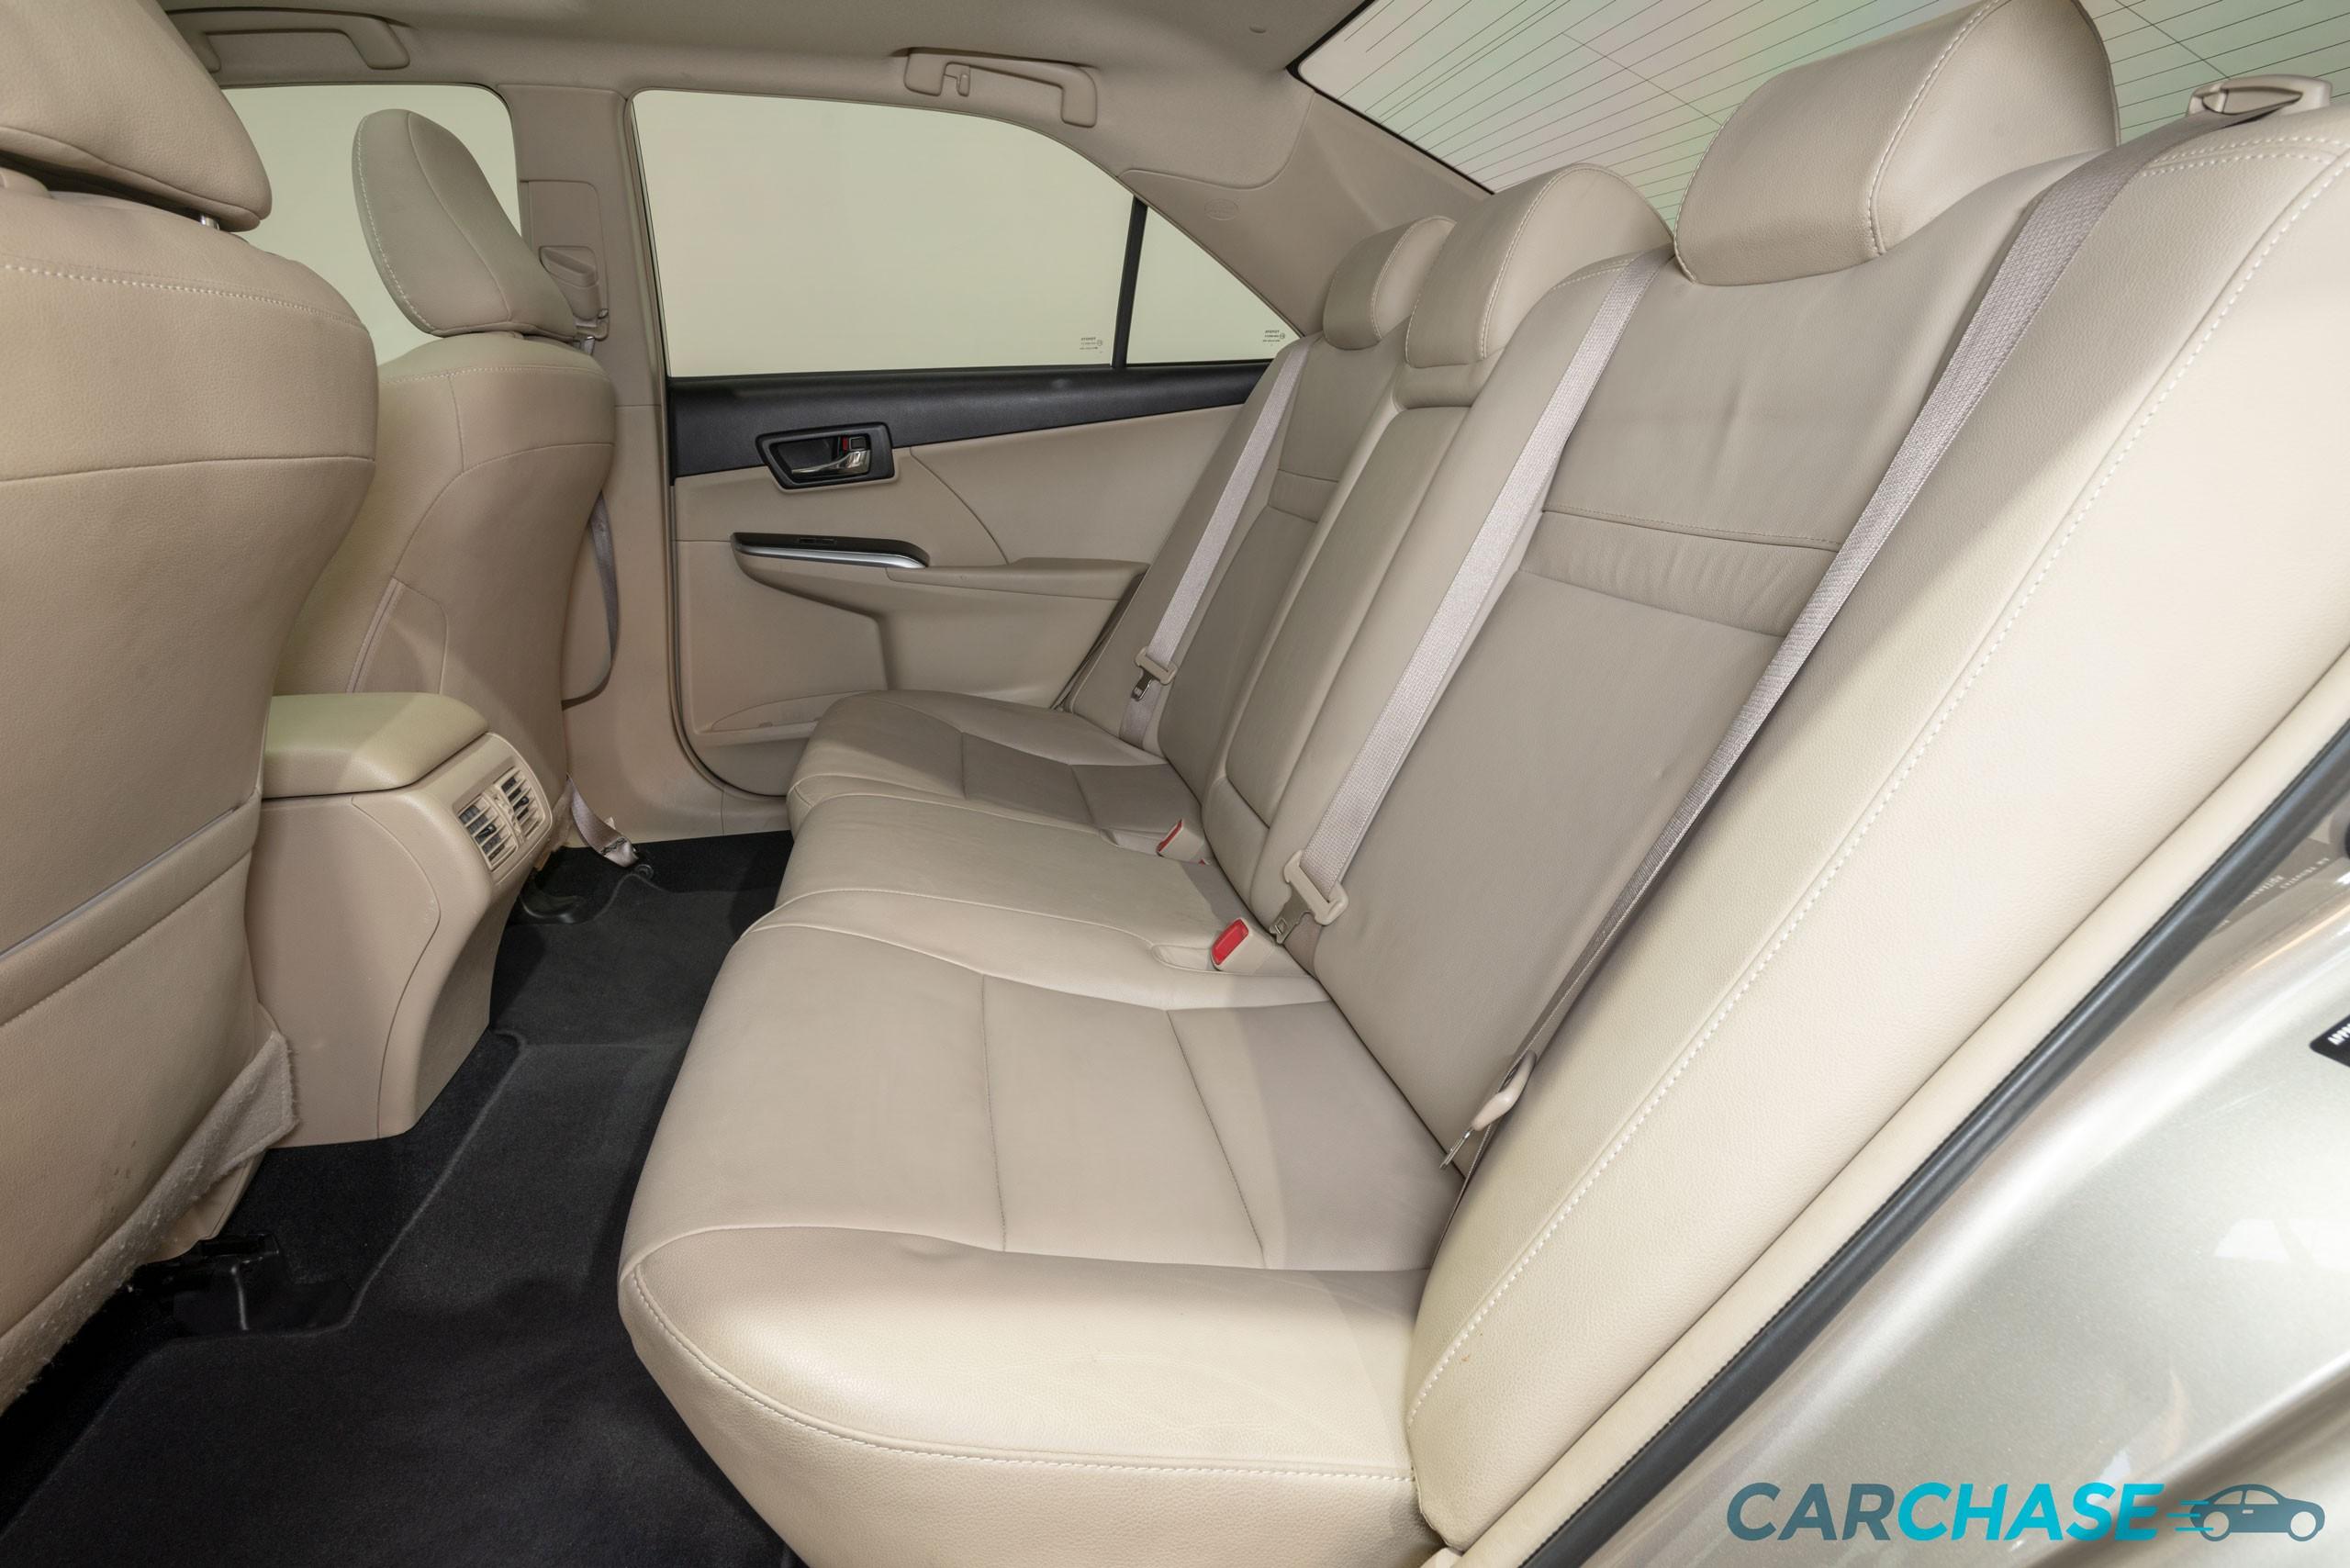 Image of passenger rear profile of 2015 Toyota Camry Atara SL